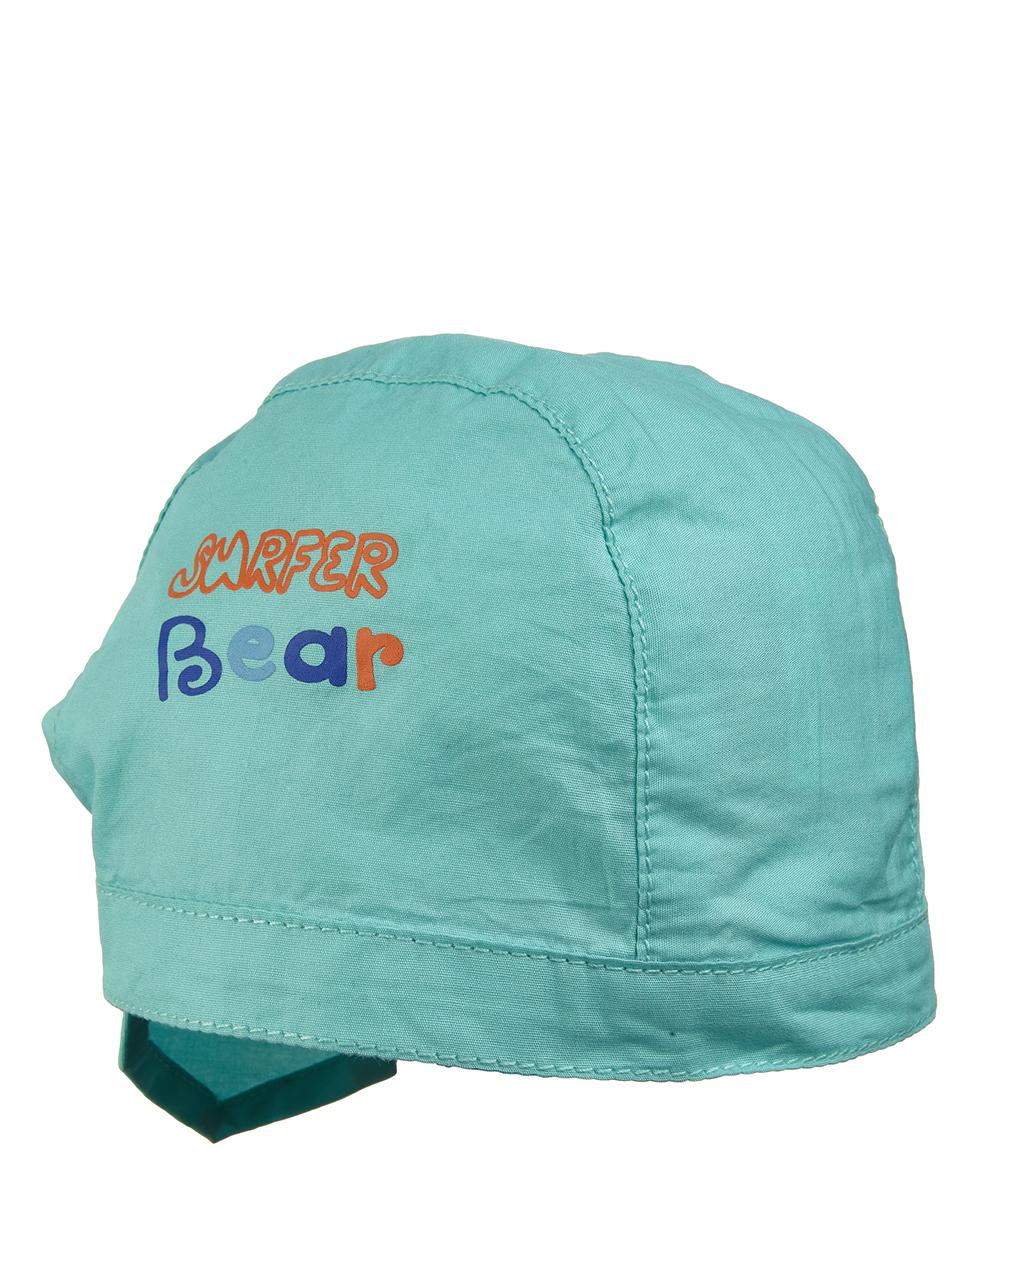 Bandana con stampa orso - Prénatal